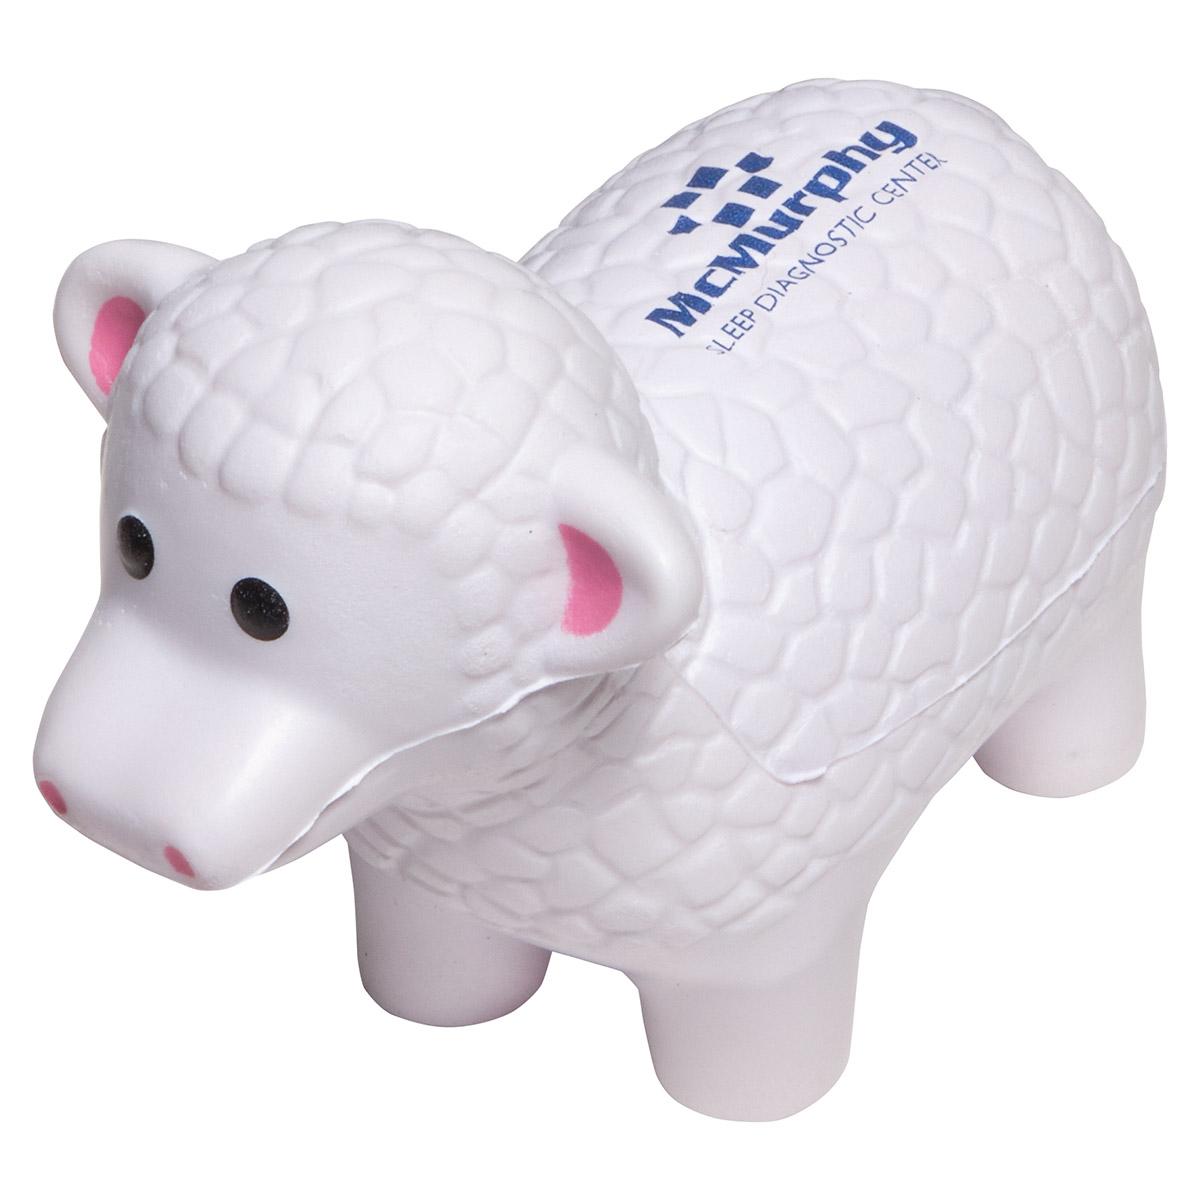 Sheep Stress Reliever, LAF-SH14, 1 Colour Imprint